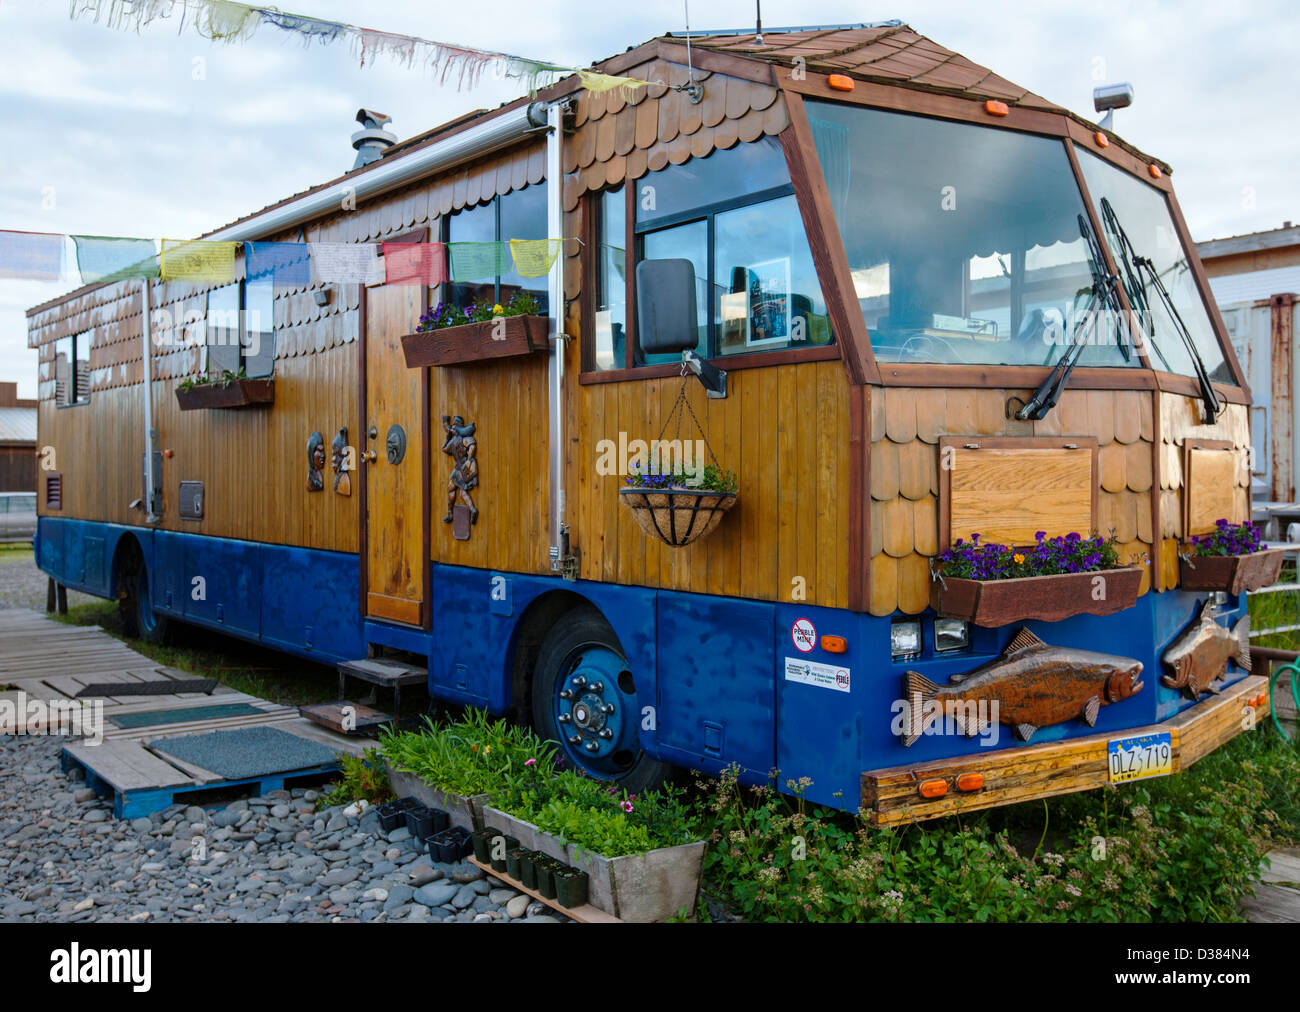 Resident of Homer Spit lives in a custom recreational vehicle, Homer, Alaska, USA - Stock Image